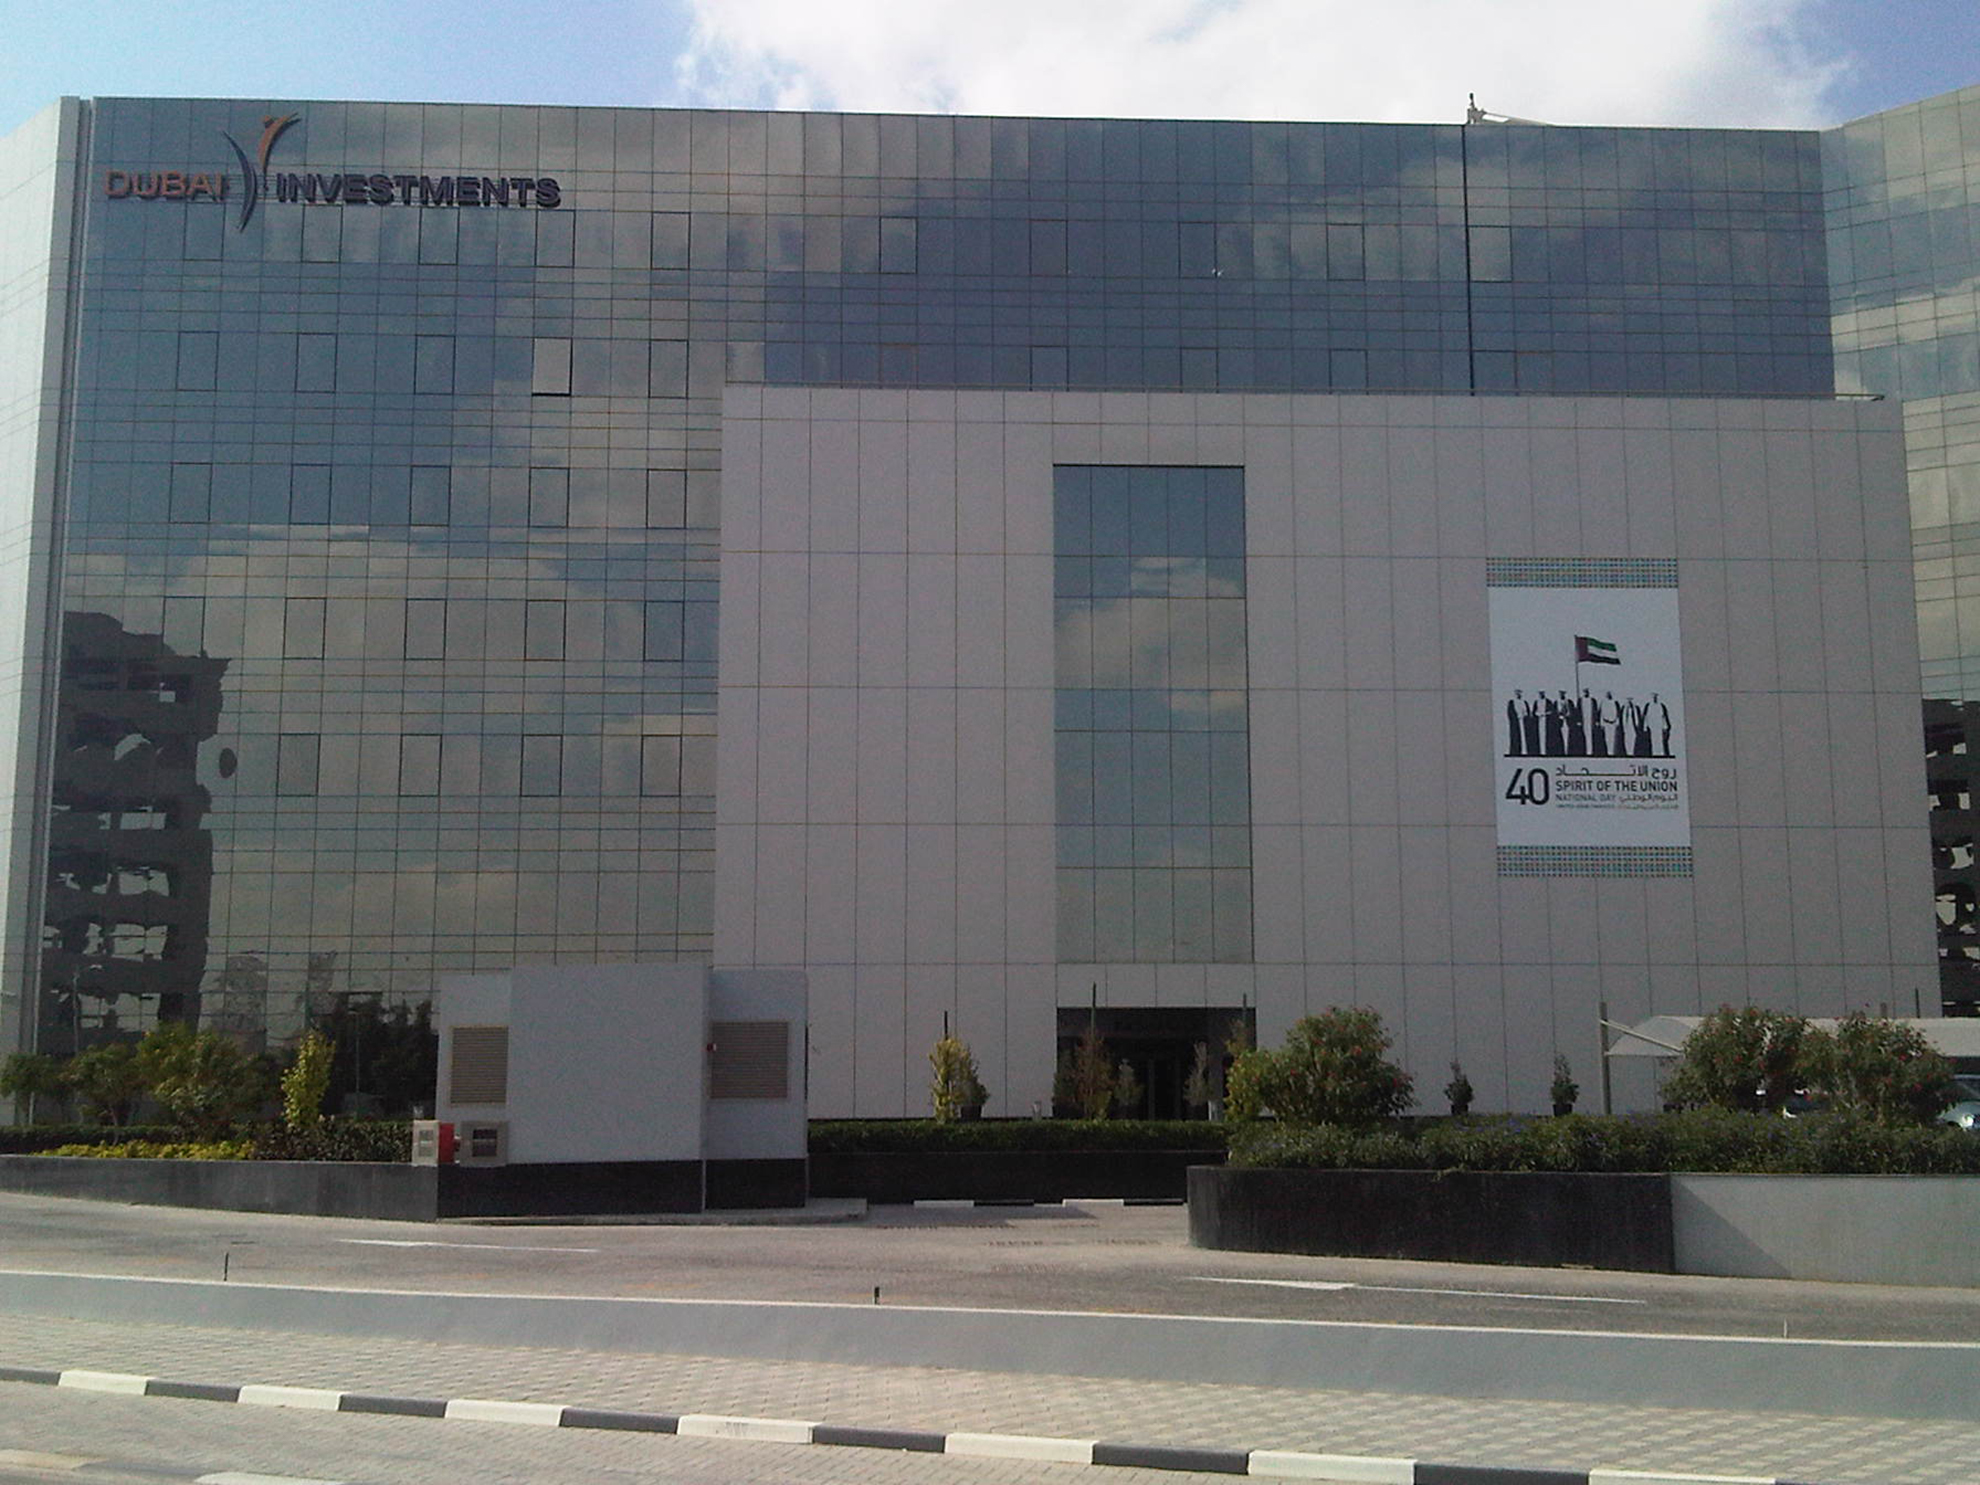 Dubai-Headquarters-investments.-Dubai.-Larson-PE-2_1585898494.jpg